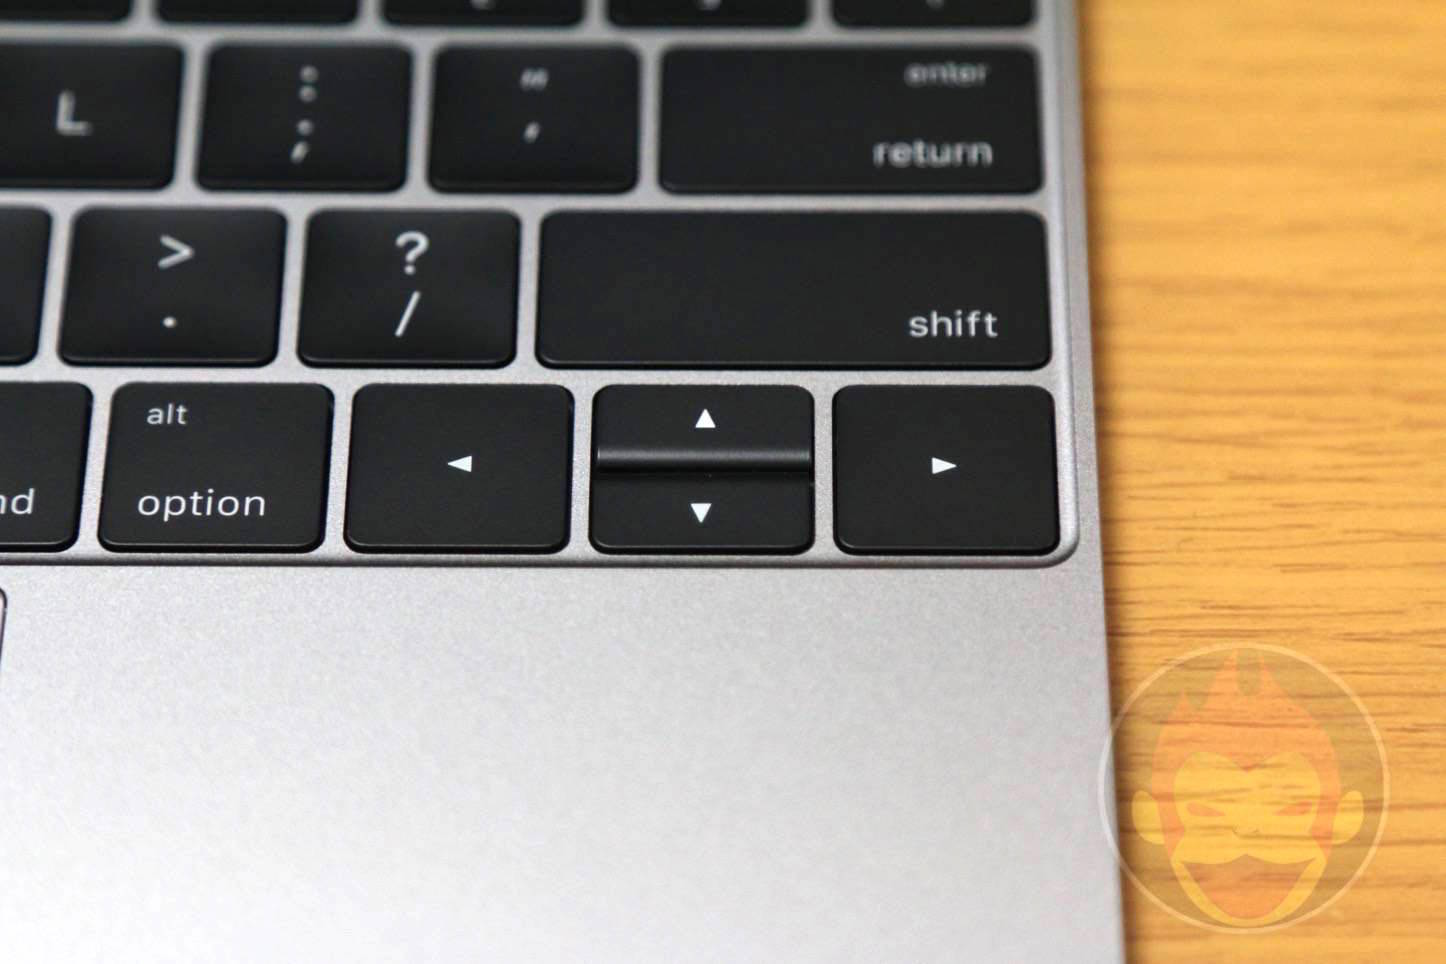 12inch-The-New-MacBook-92.JPG